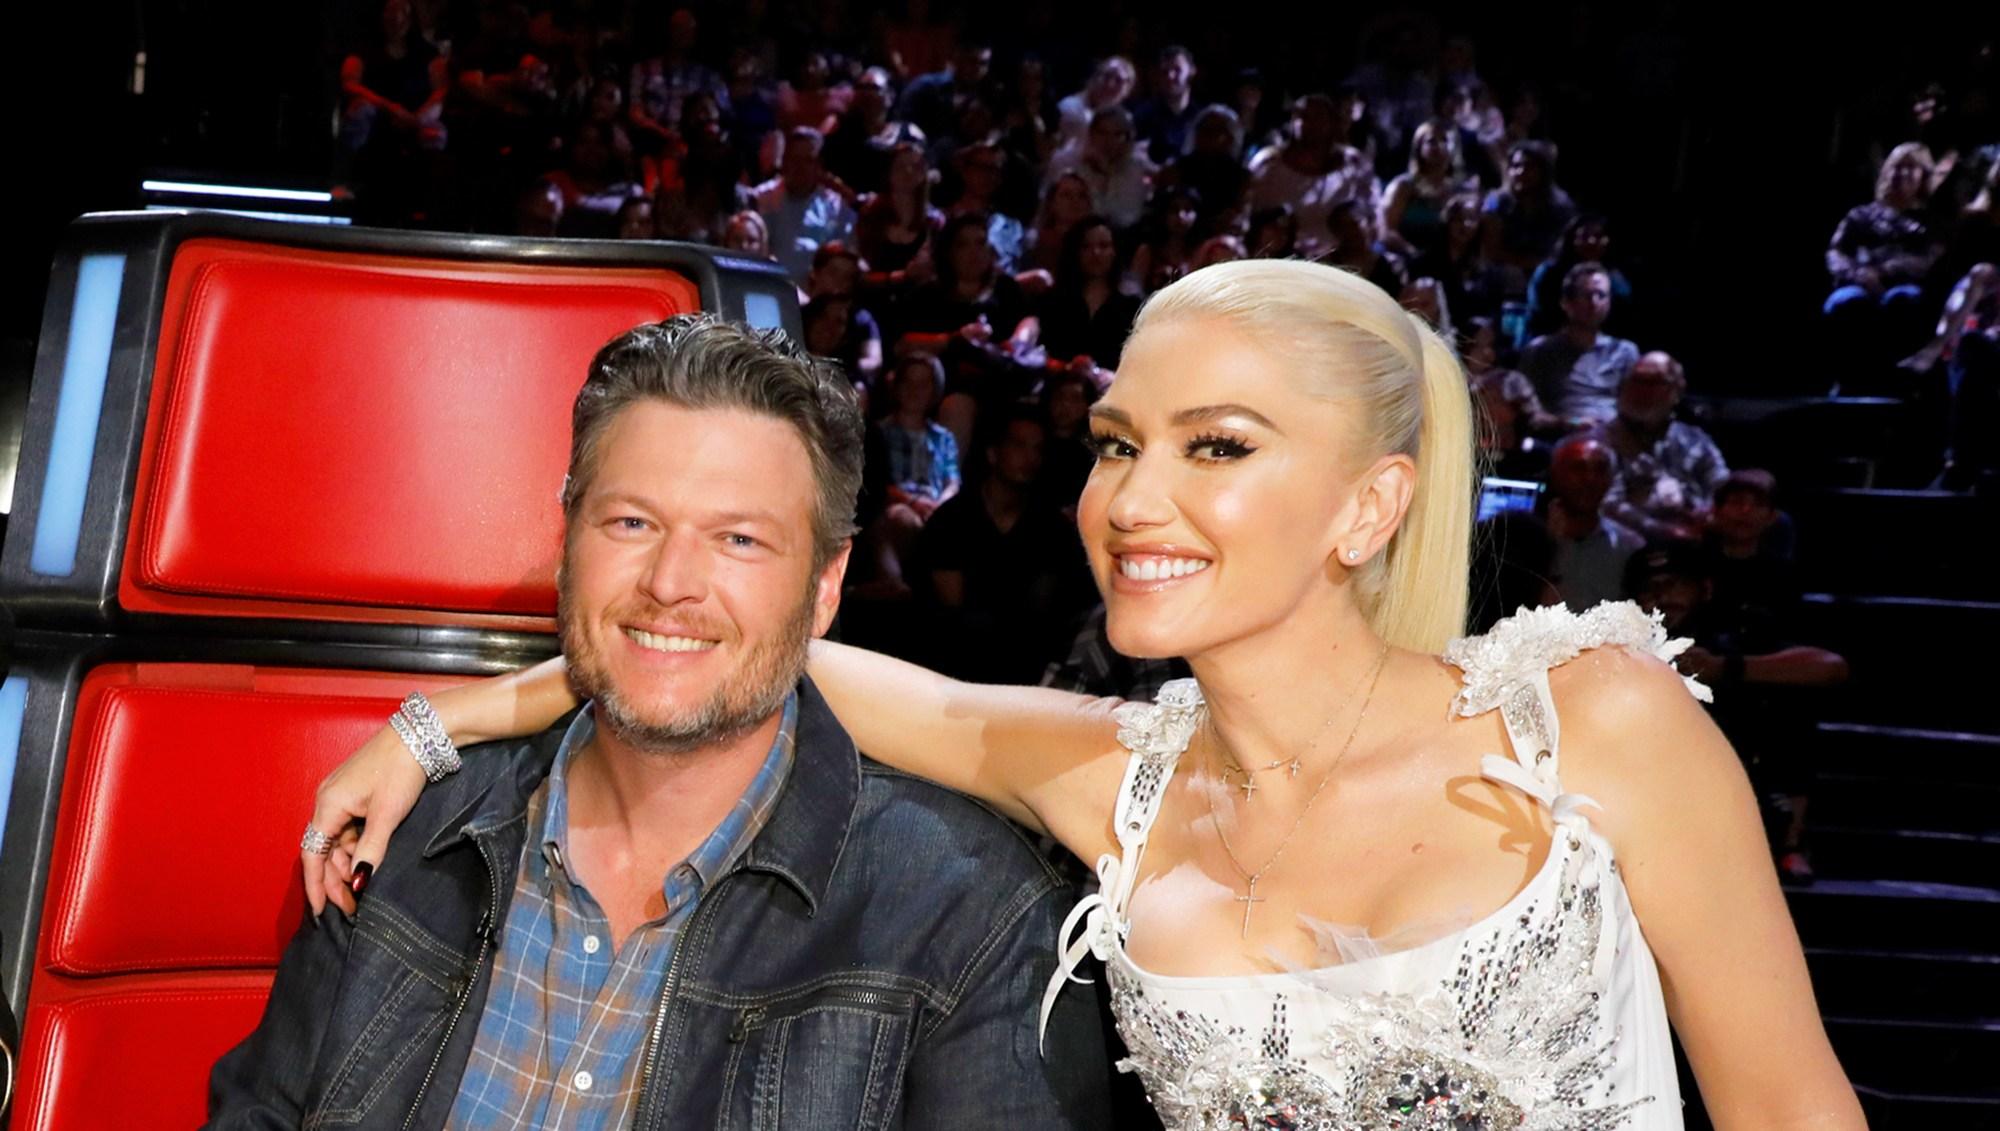 Blake Shelton and Gwen Stefani on 'The Voice'